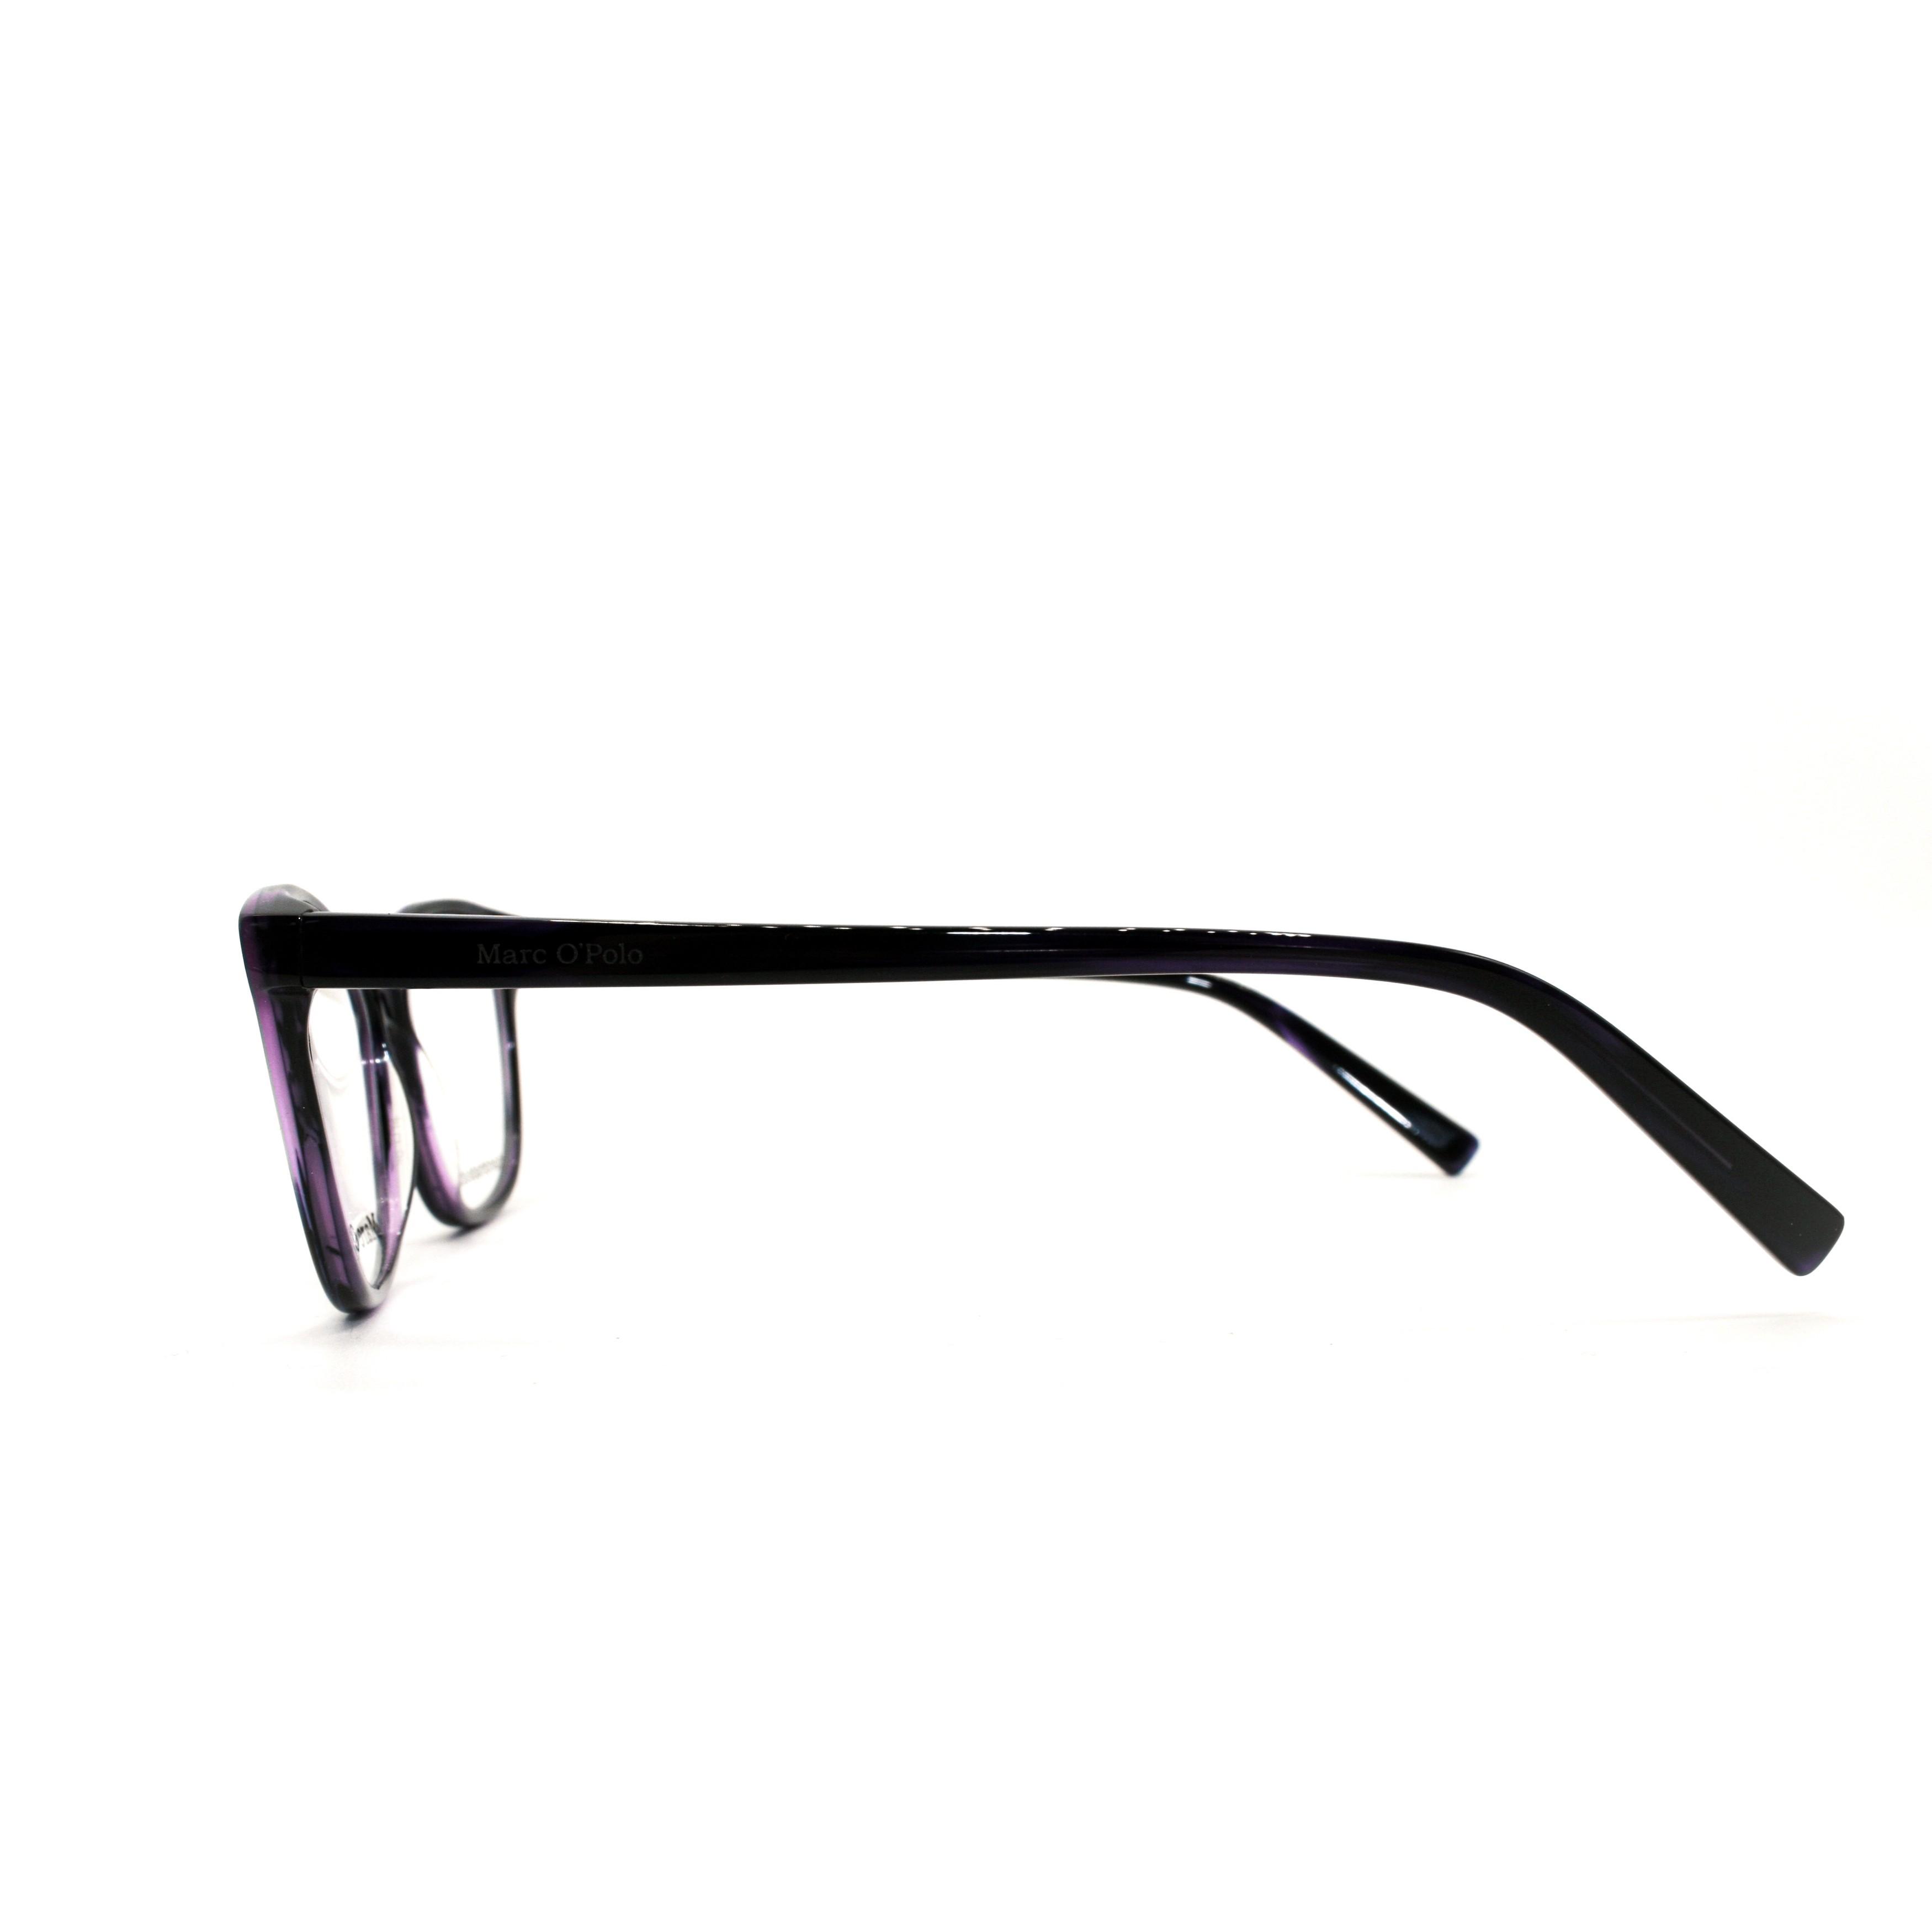 Damenbrille Marc O´ Polo 501016 lila 50 - Optik Wolf